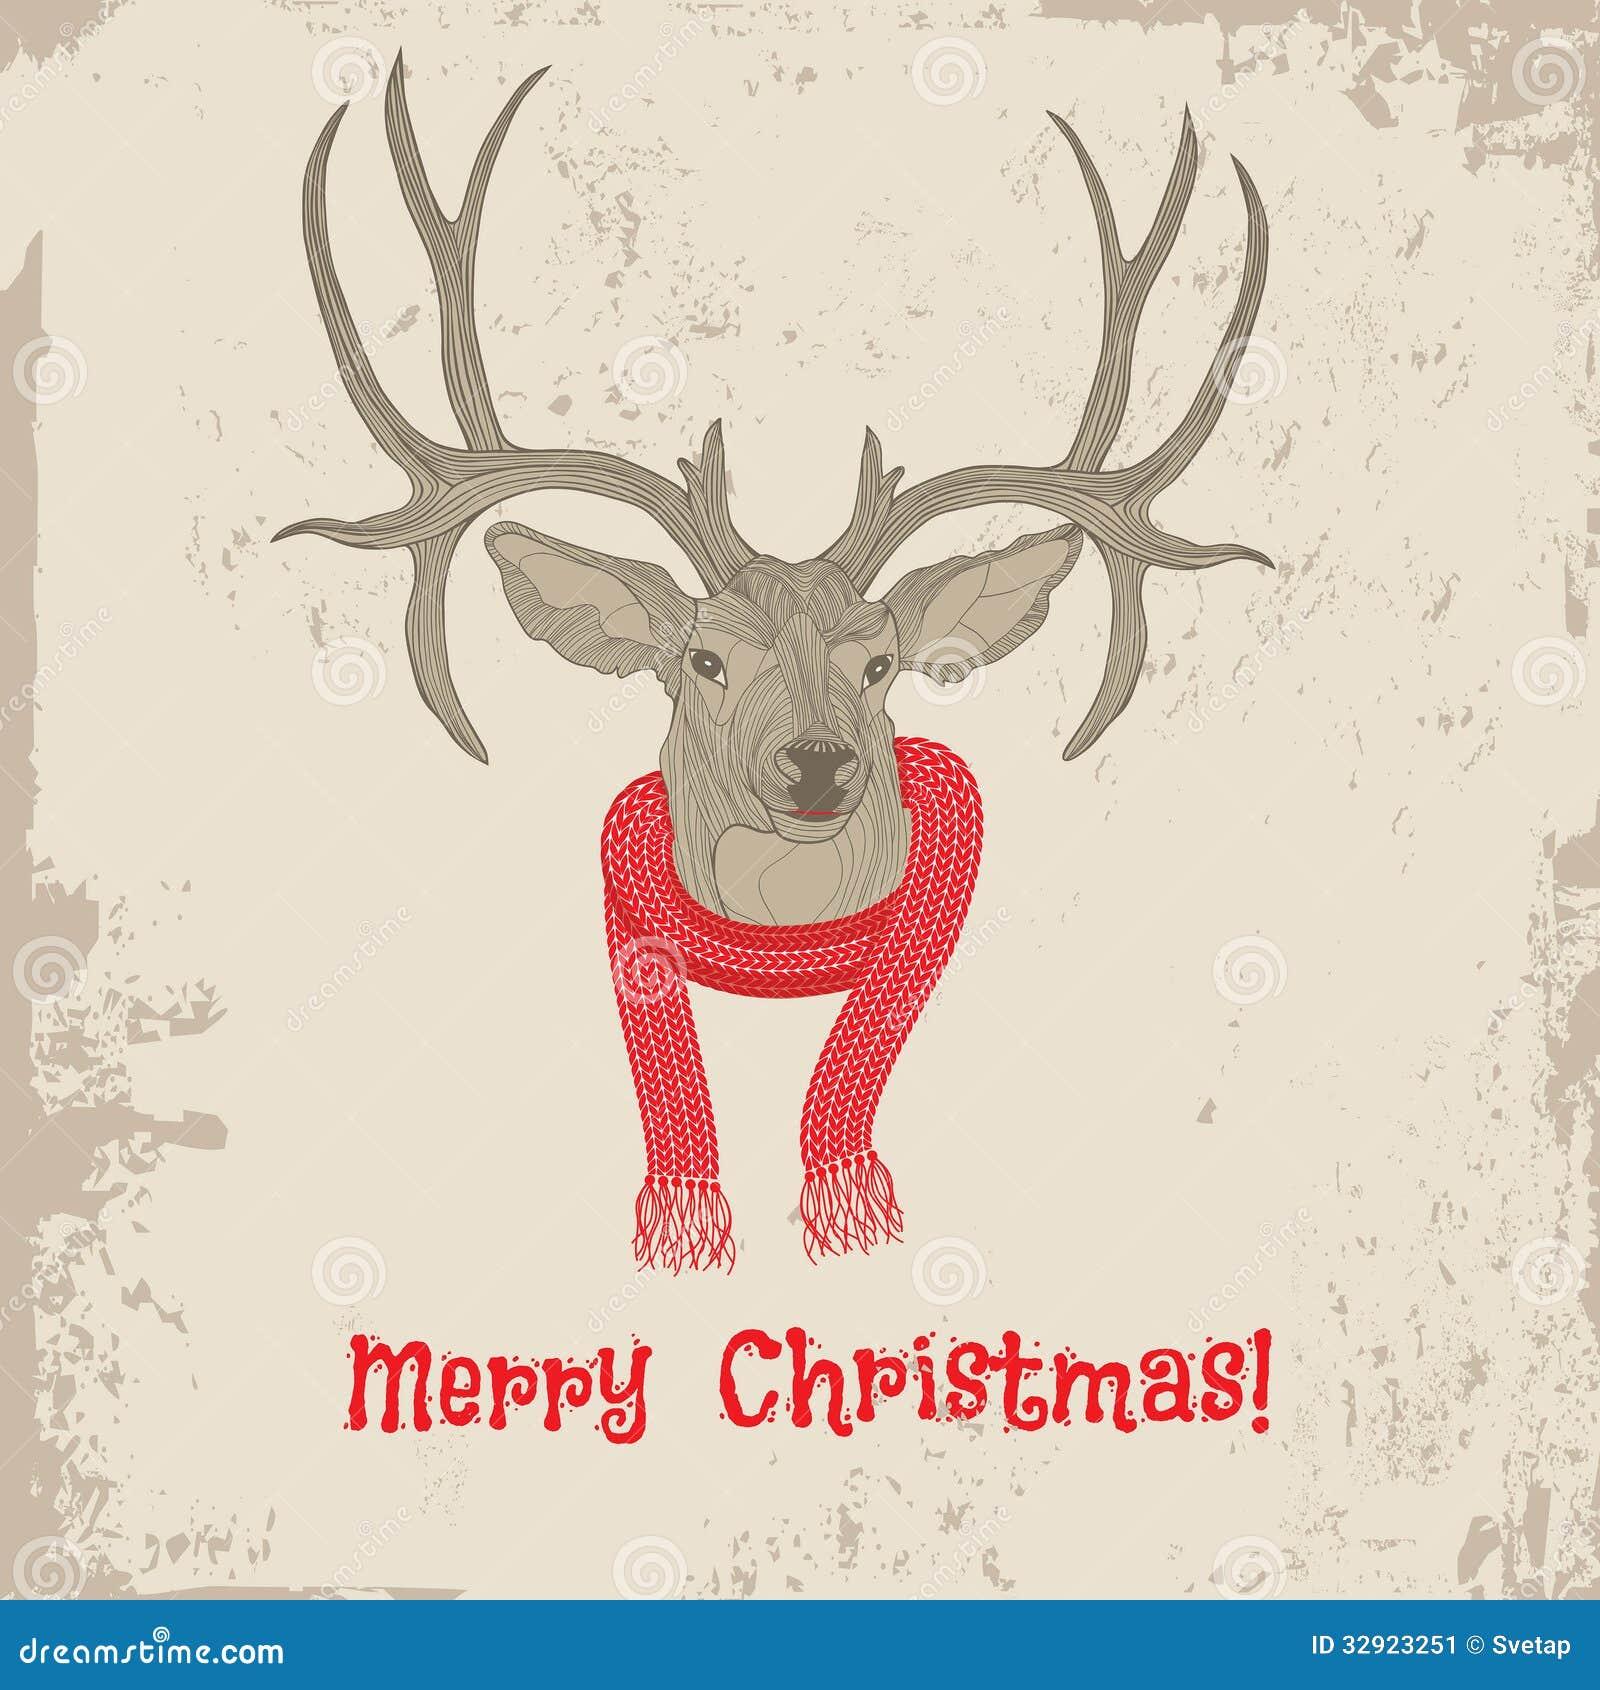 Deer Head Vintage Christmas Card Stock Image - Image: 32923251